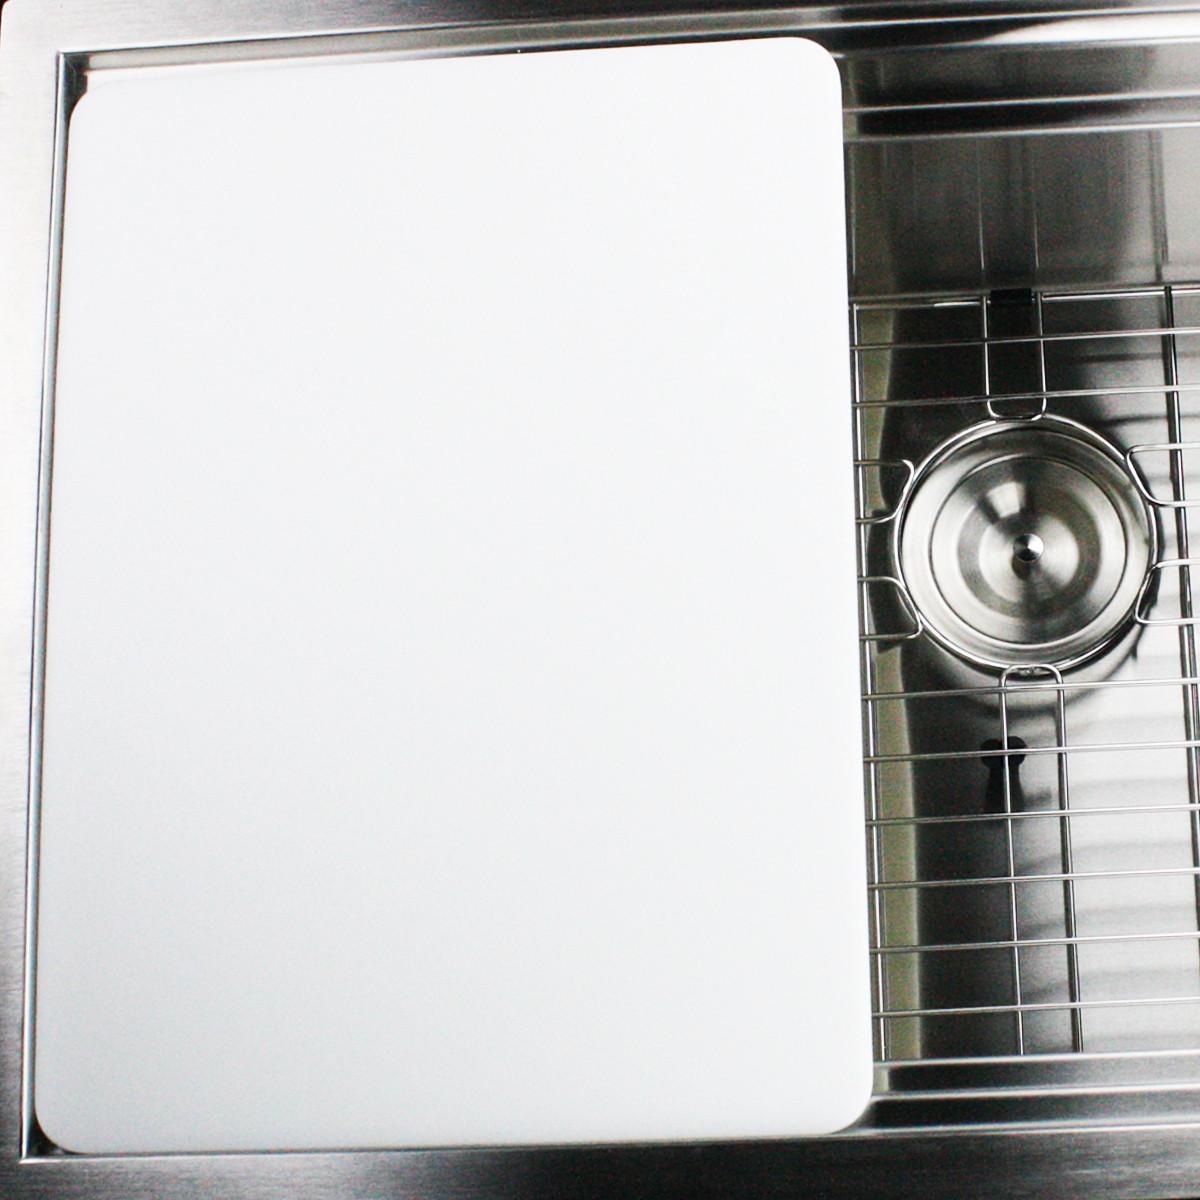 Nantucket Sinks CB-ZRPS32 Premium Kitchen Rectangular Plastic Cutting Board